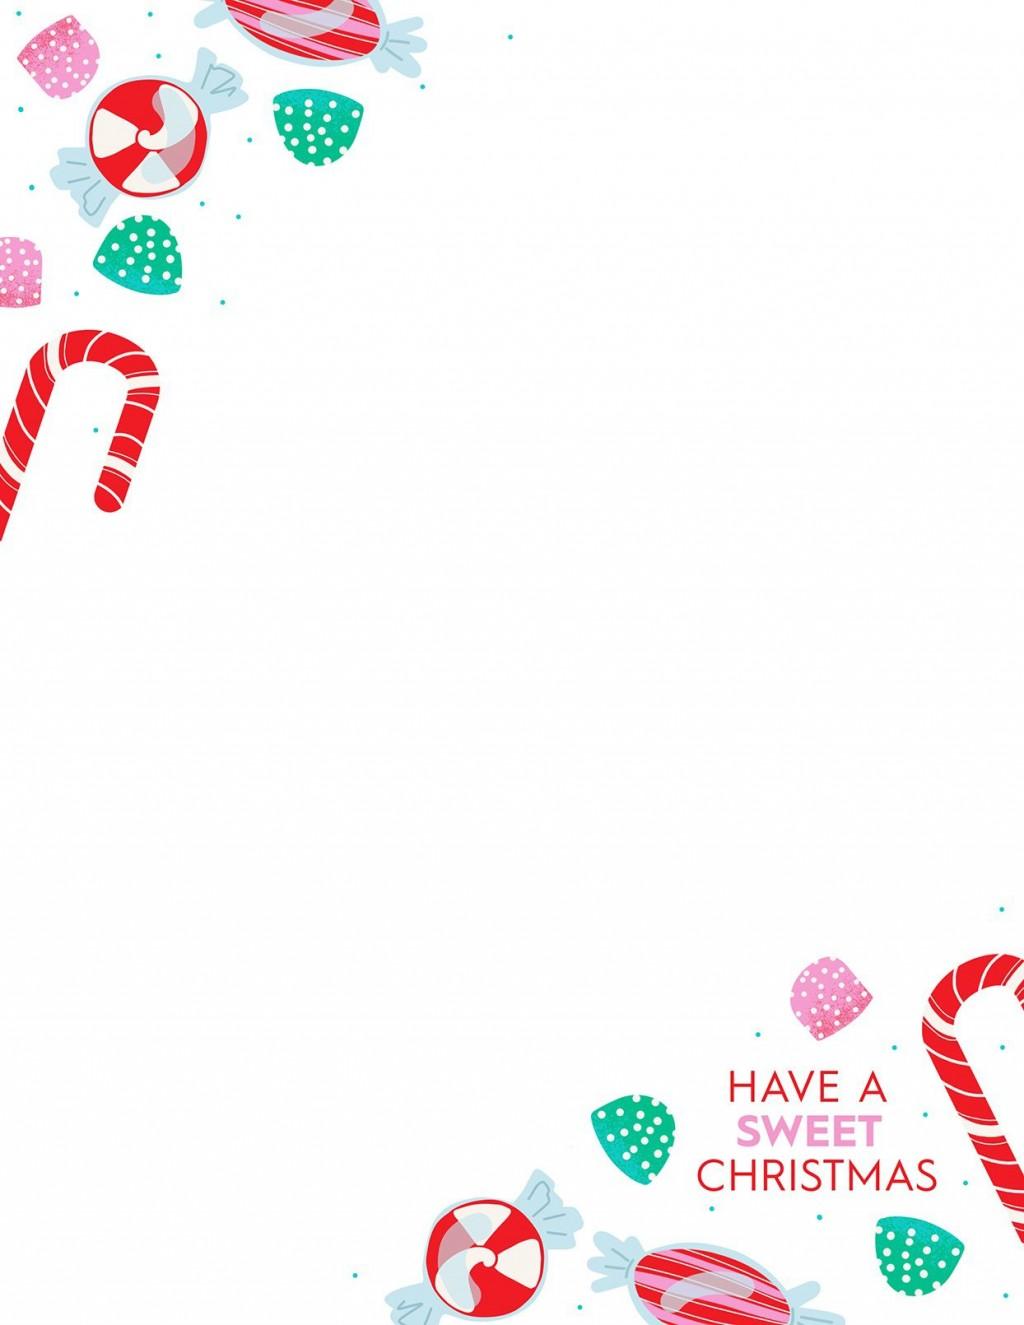 012 Sensational Free Christma Letter Template For Microsoft Word Sample  Downloadable NewsletterLarge